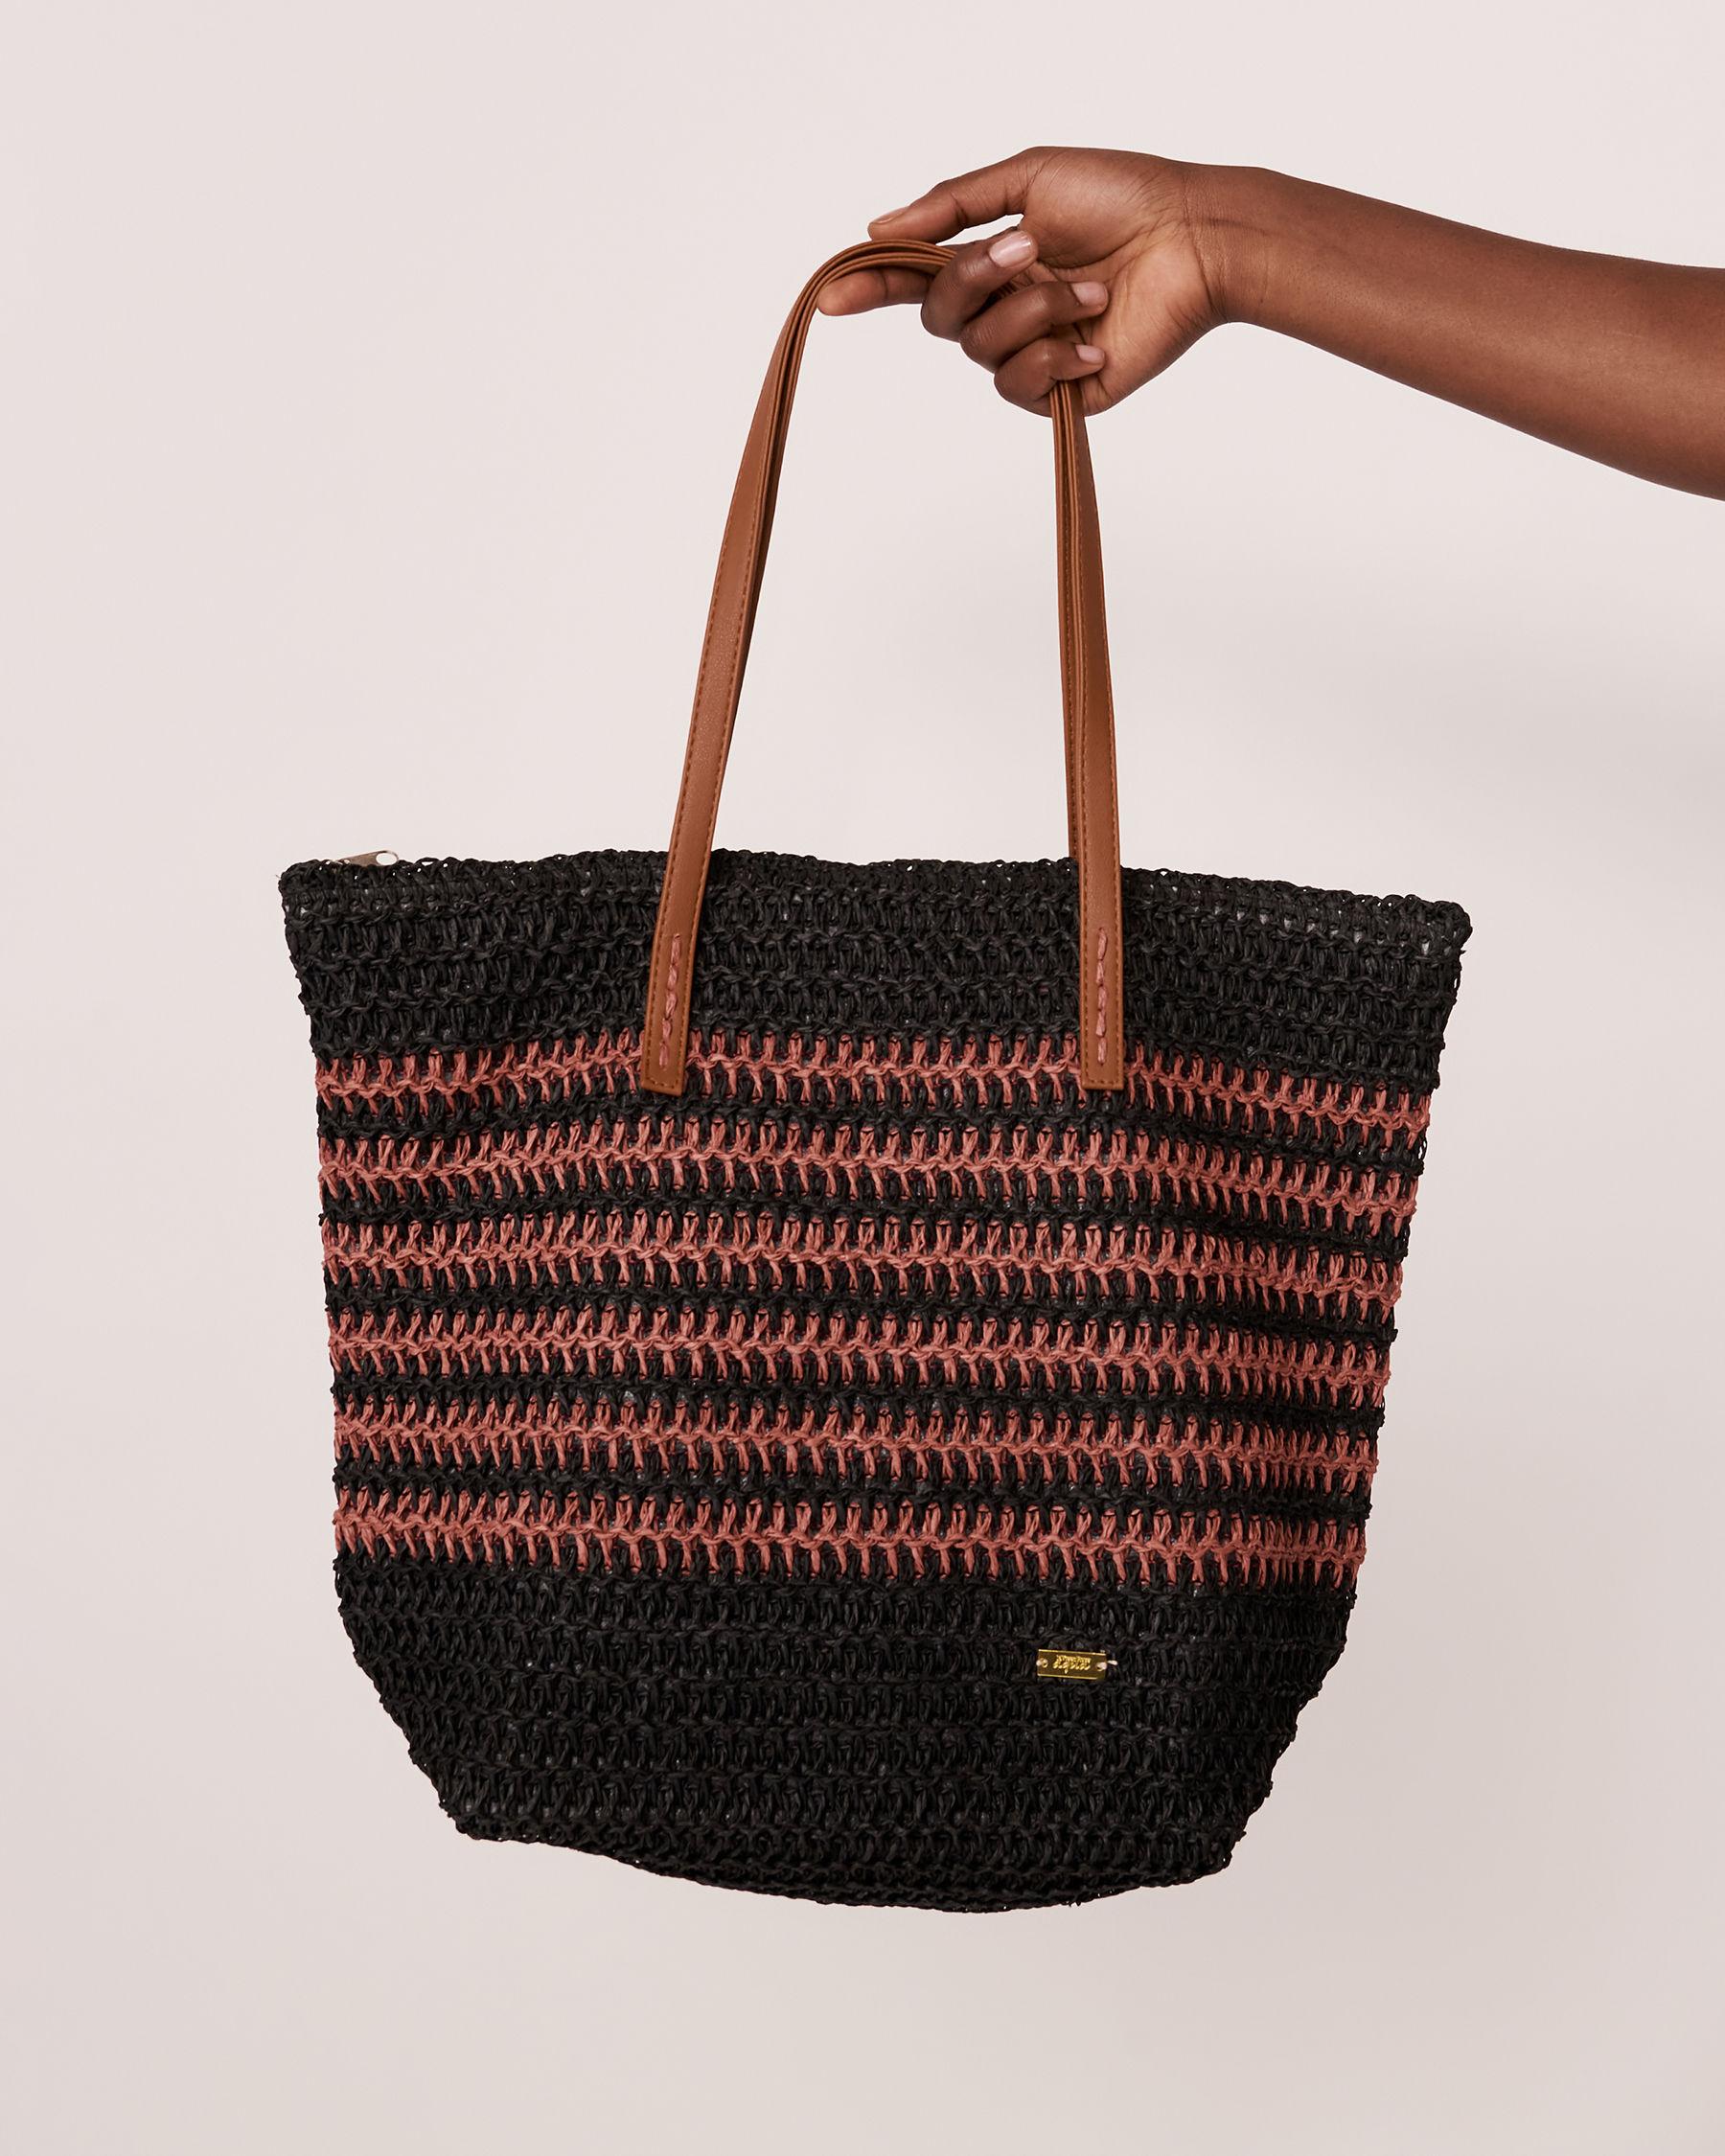 LA VIE EN ROSE AQUA Straw Beach Bag Black 80500007 - View2